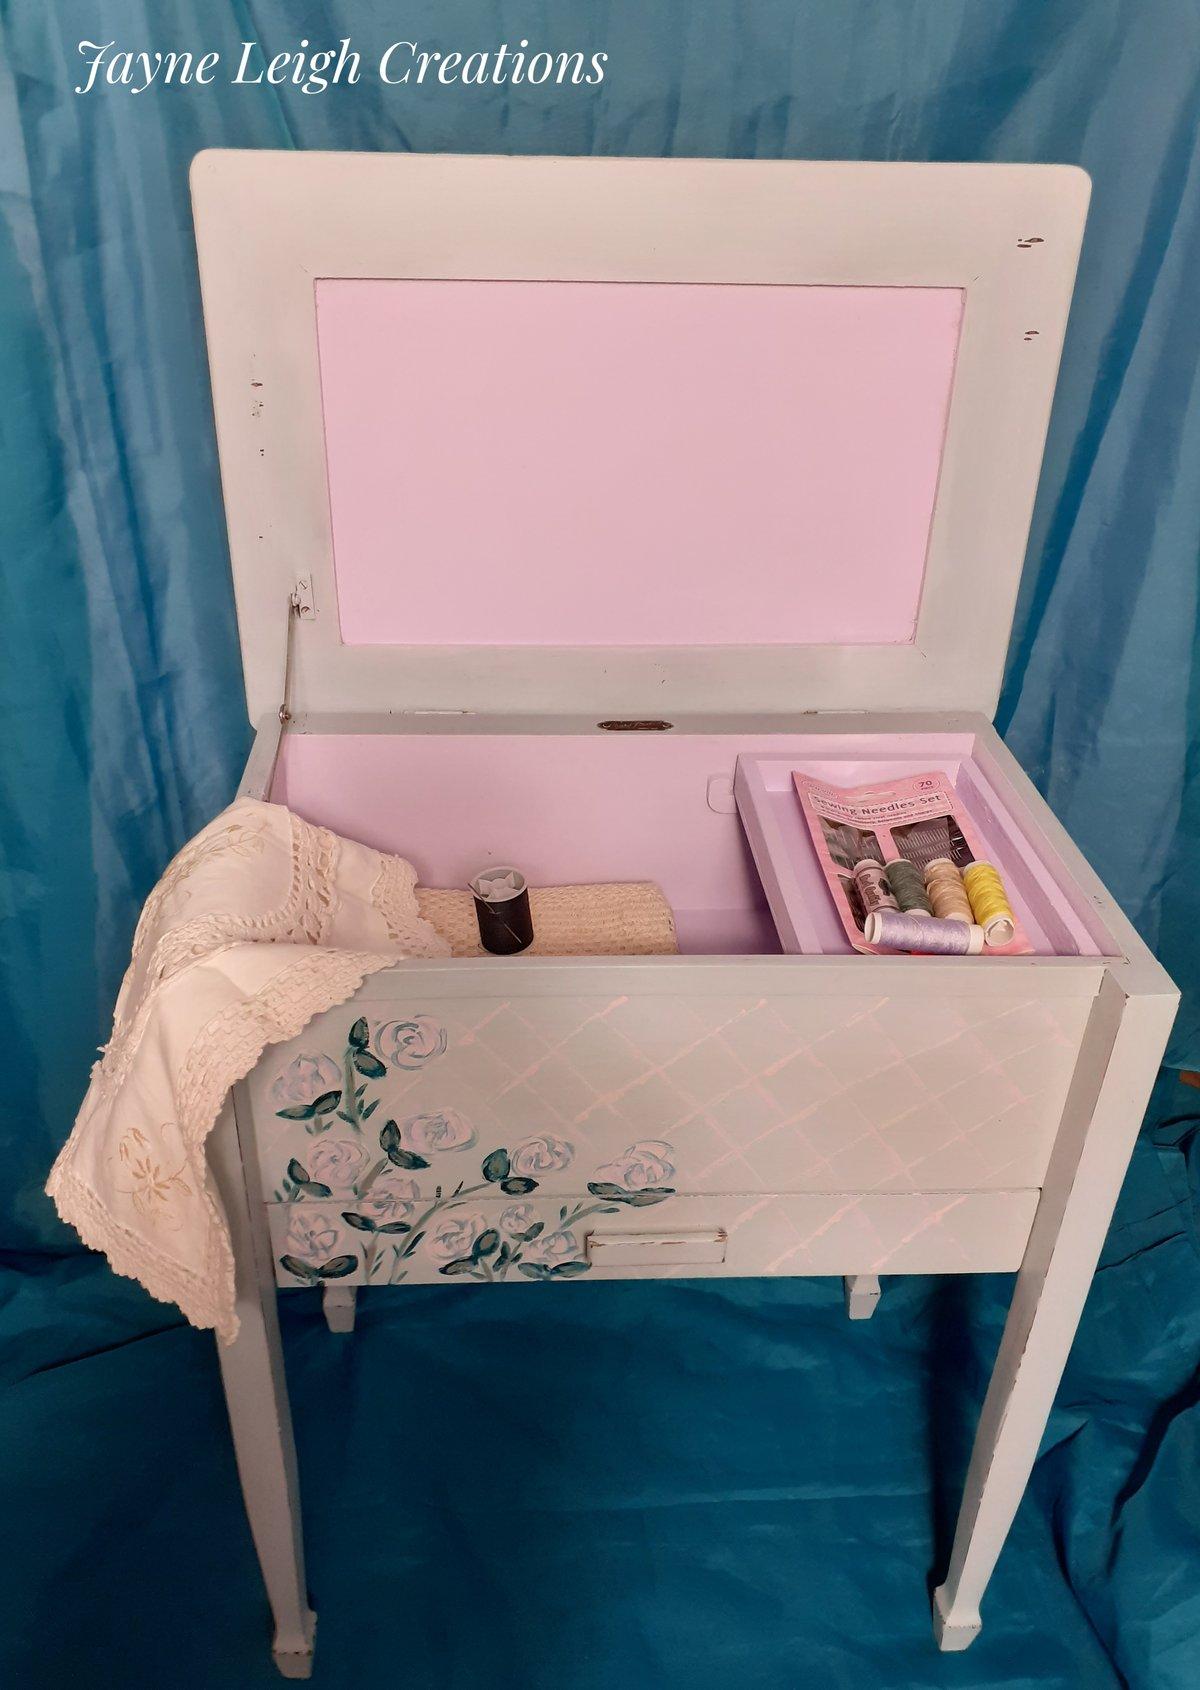 Image of Vintage Sewing Box